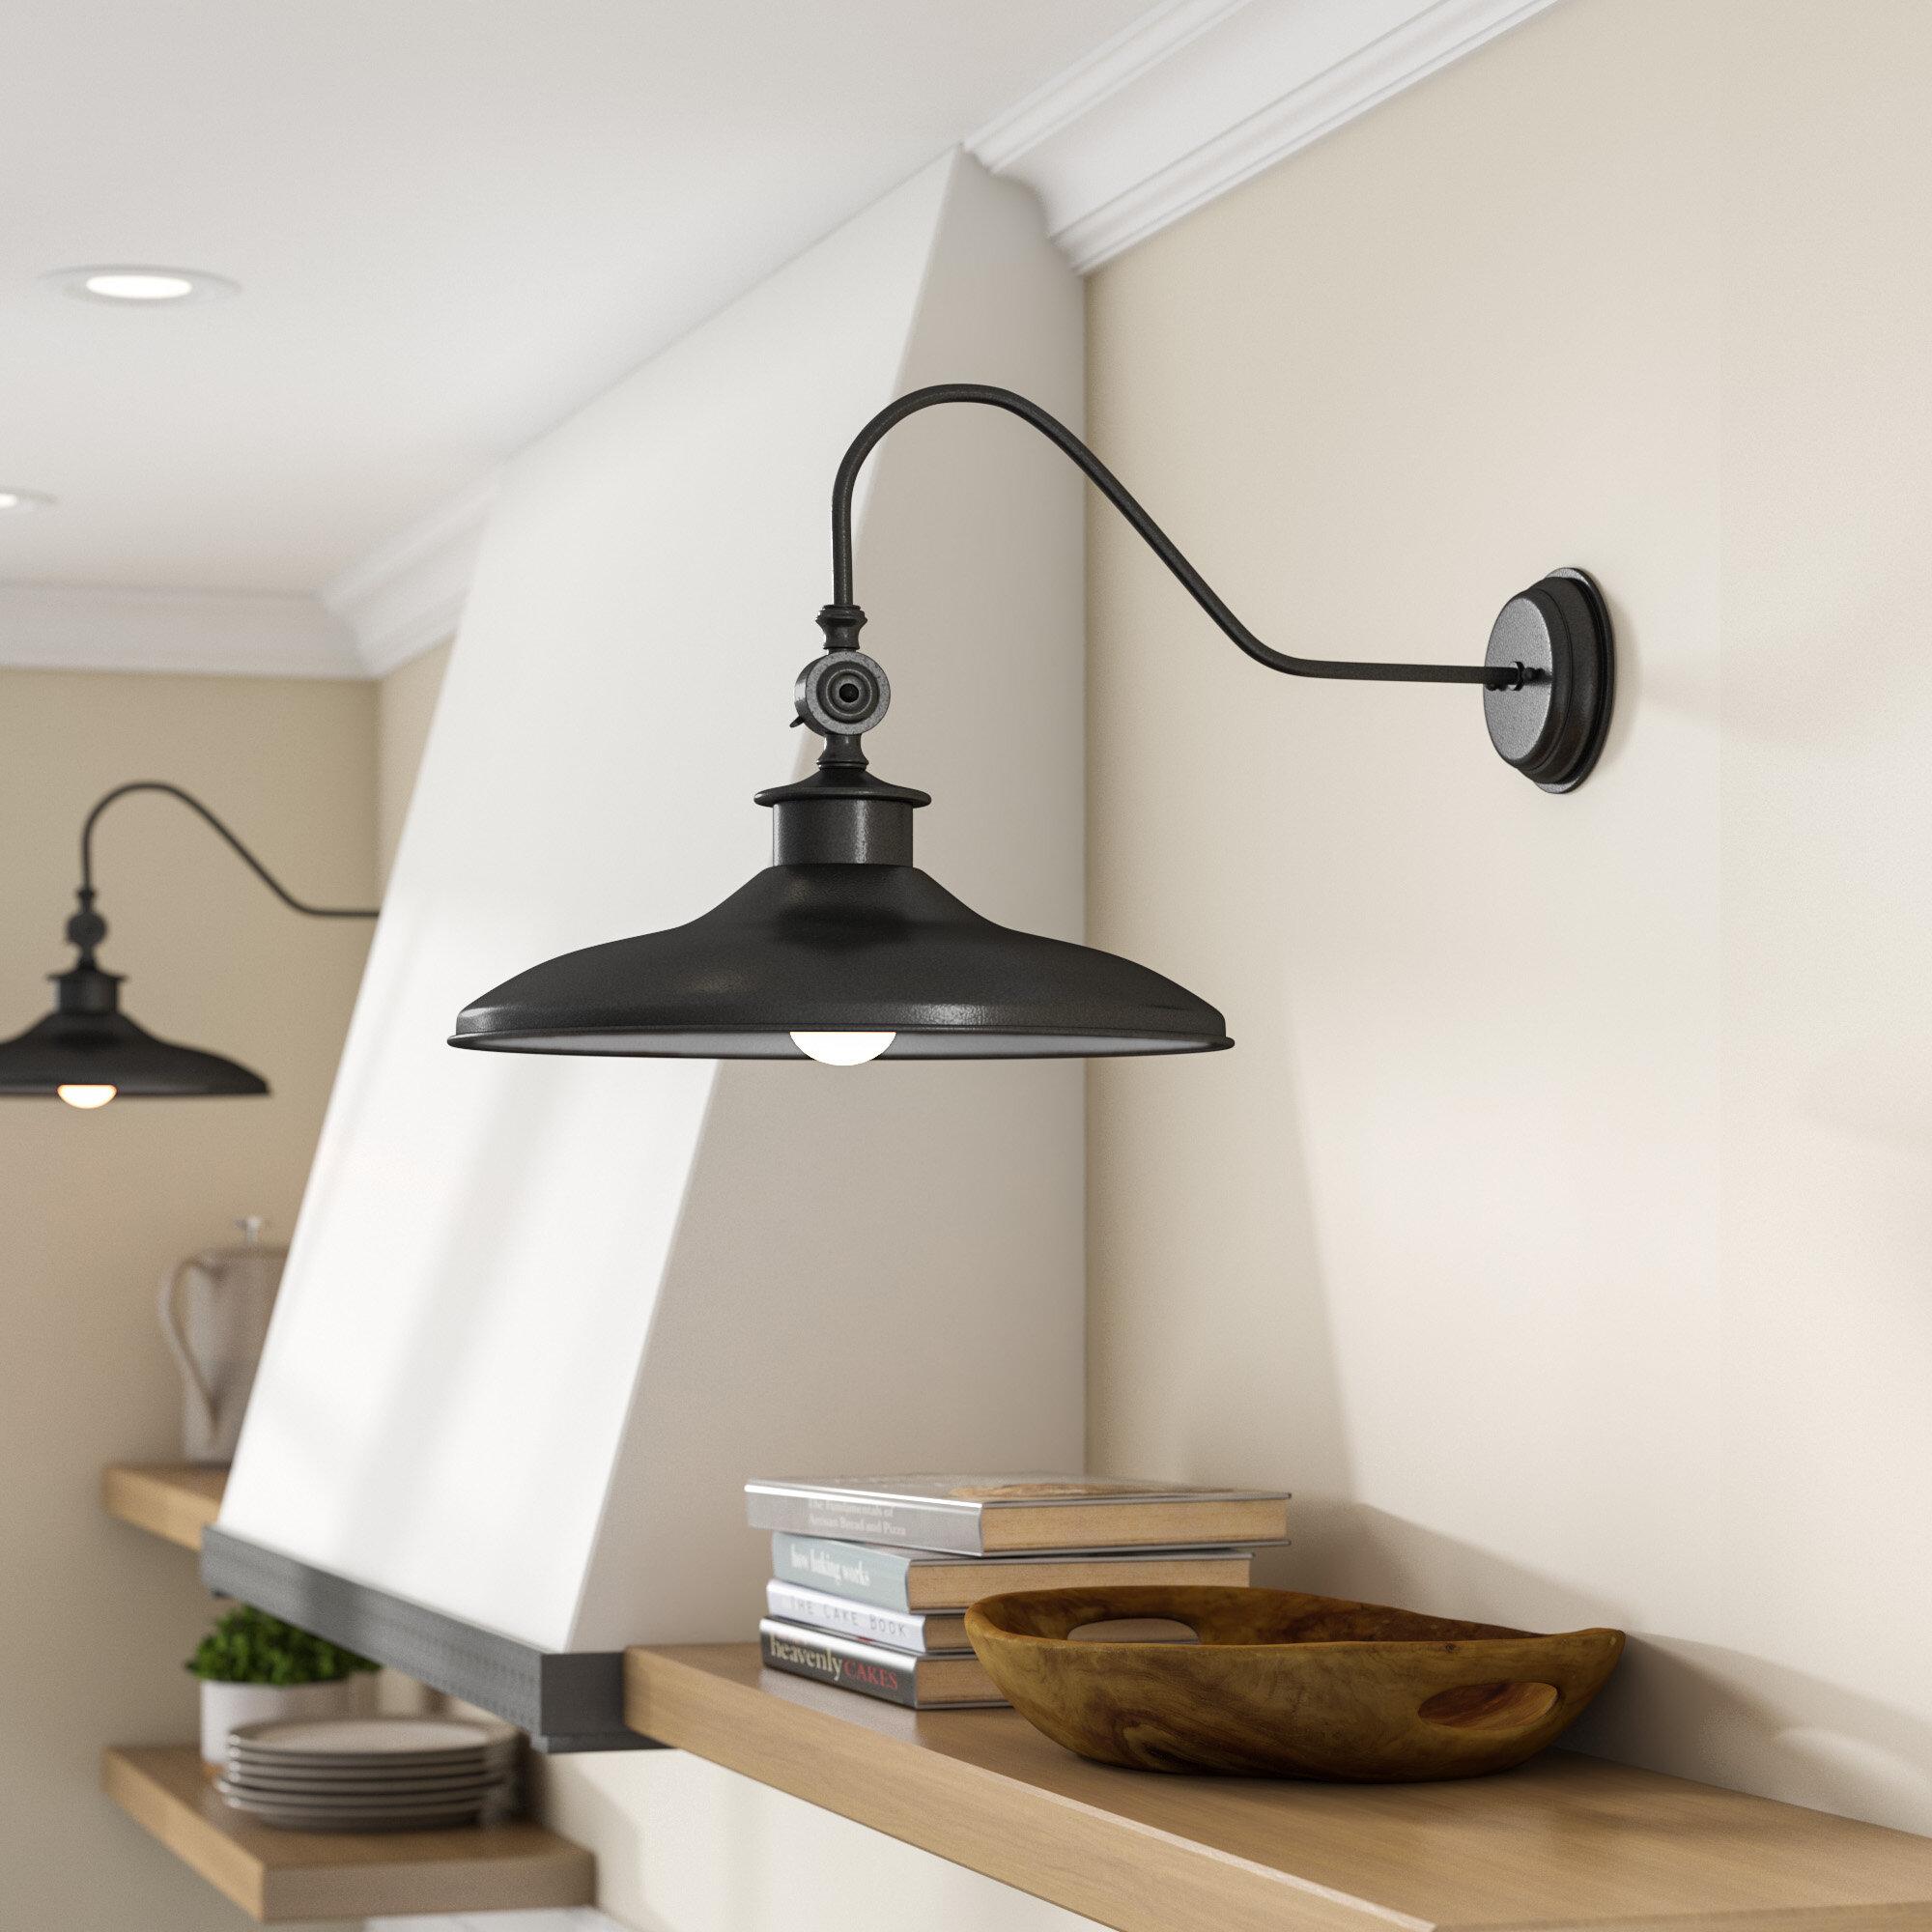 laurel foundry modern farmhouse spartansburg 1 light barn light